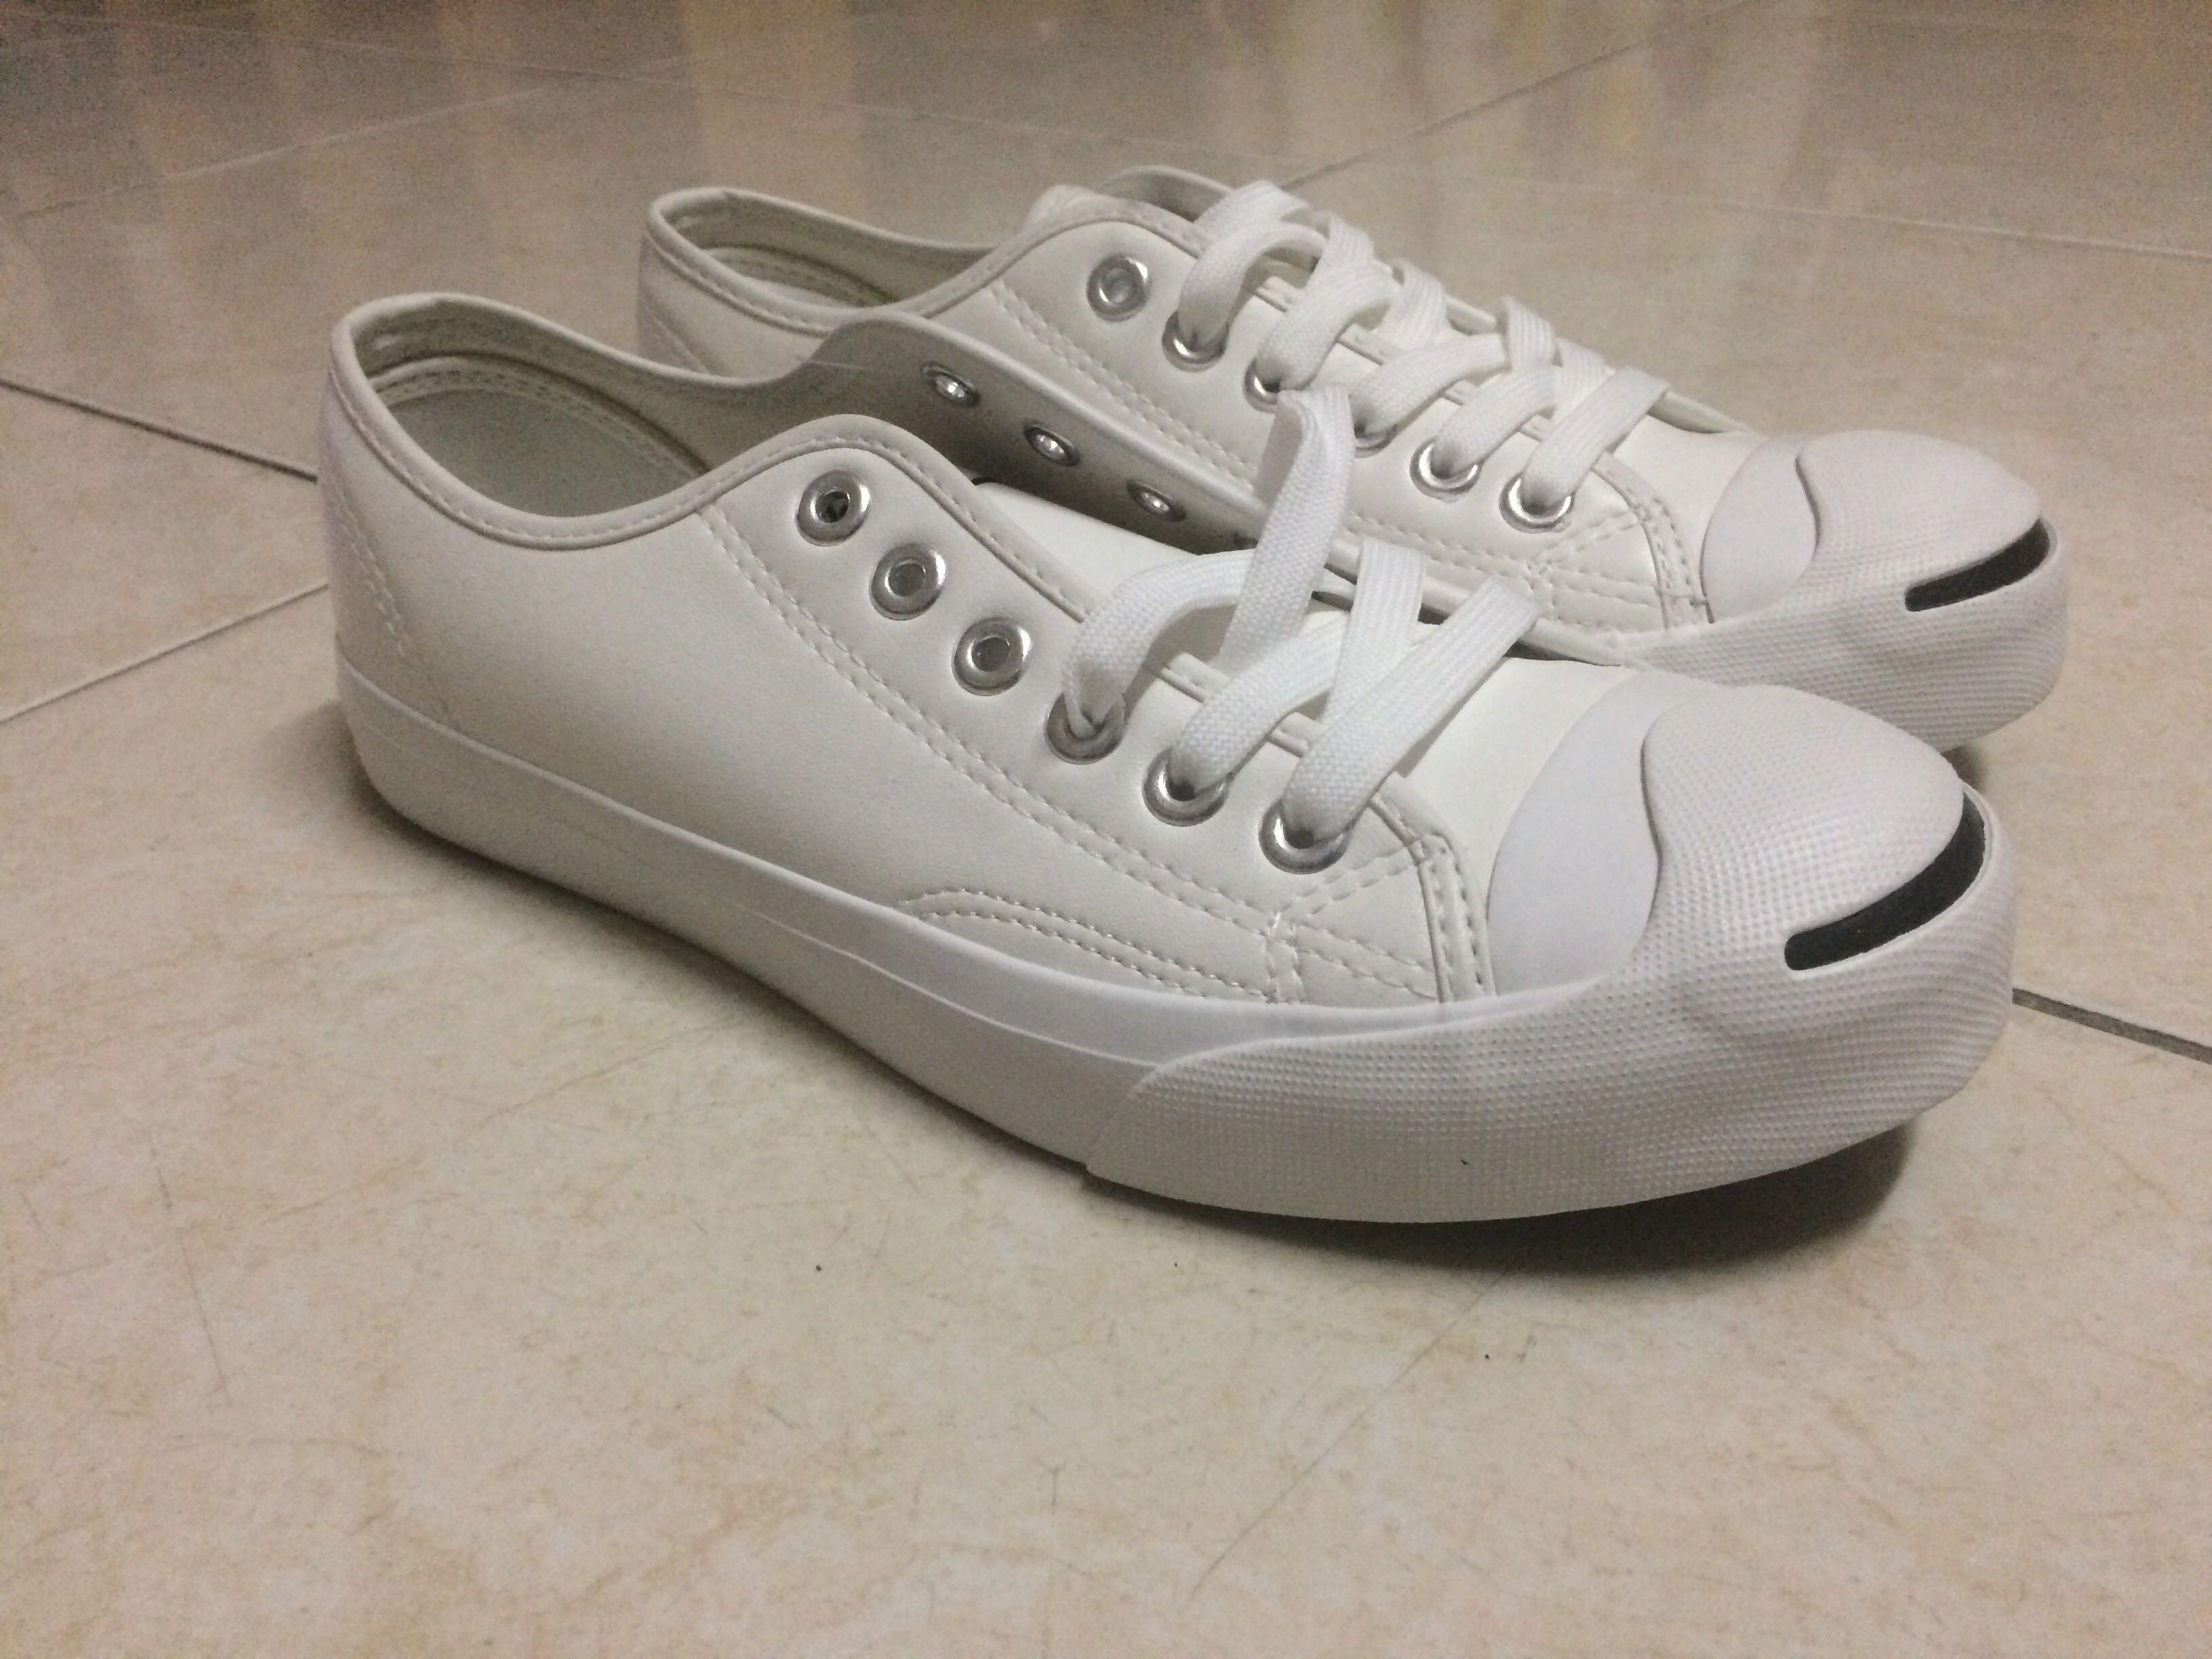 bc58e91bc9eb Home · Men s Fashion · Footwear. photo photo photo photo